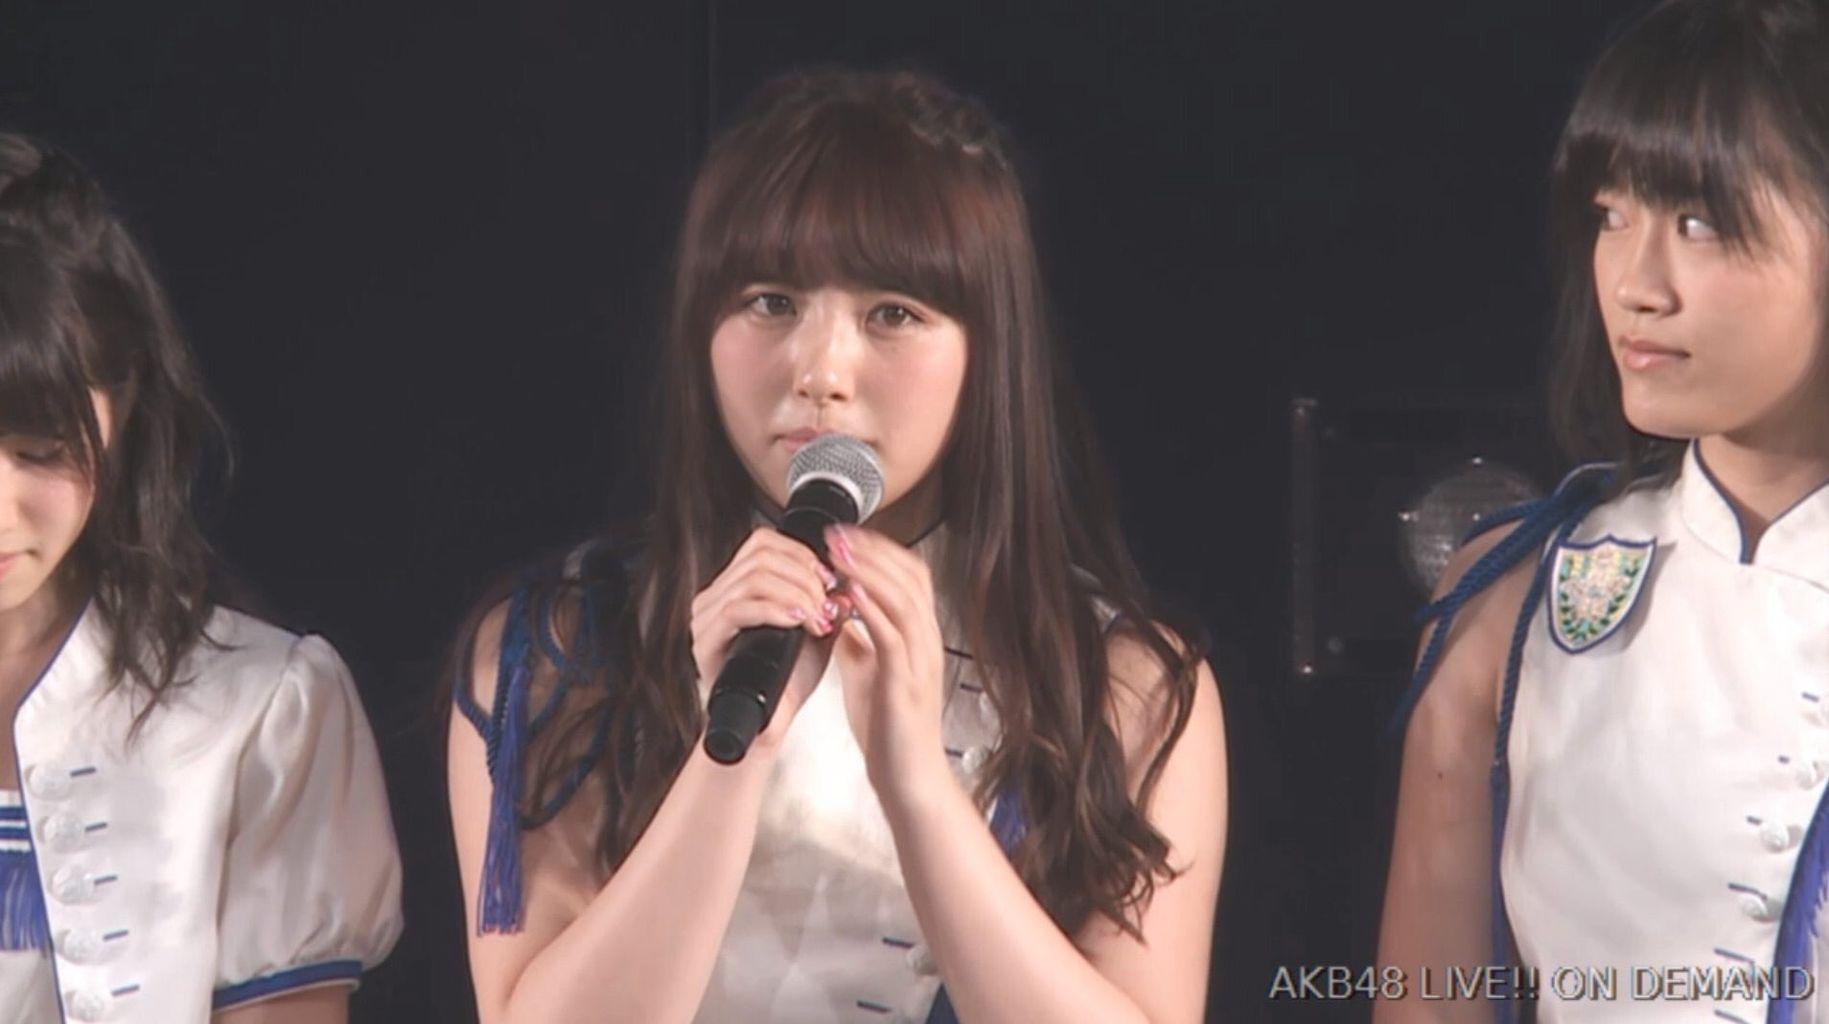 【速報】AKB48大和田南那が卒業発表。卒業時期は未定